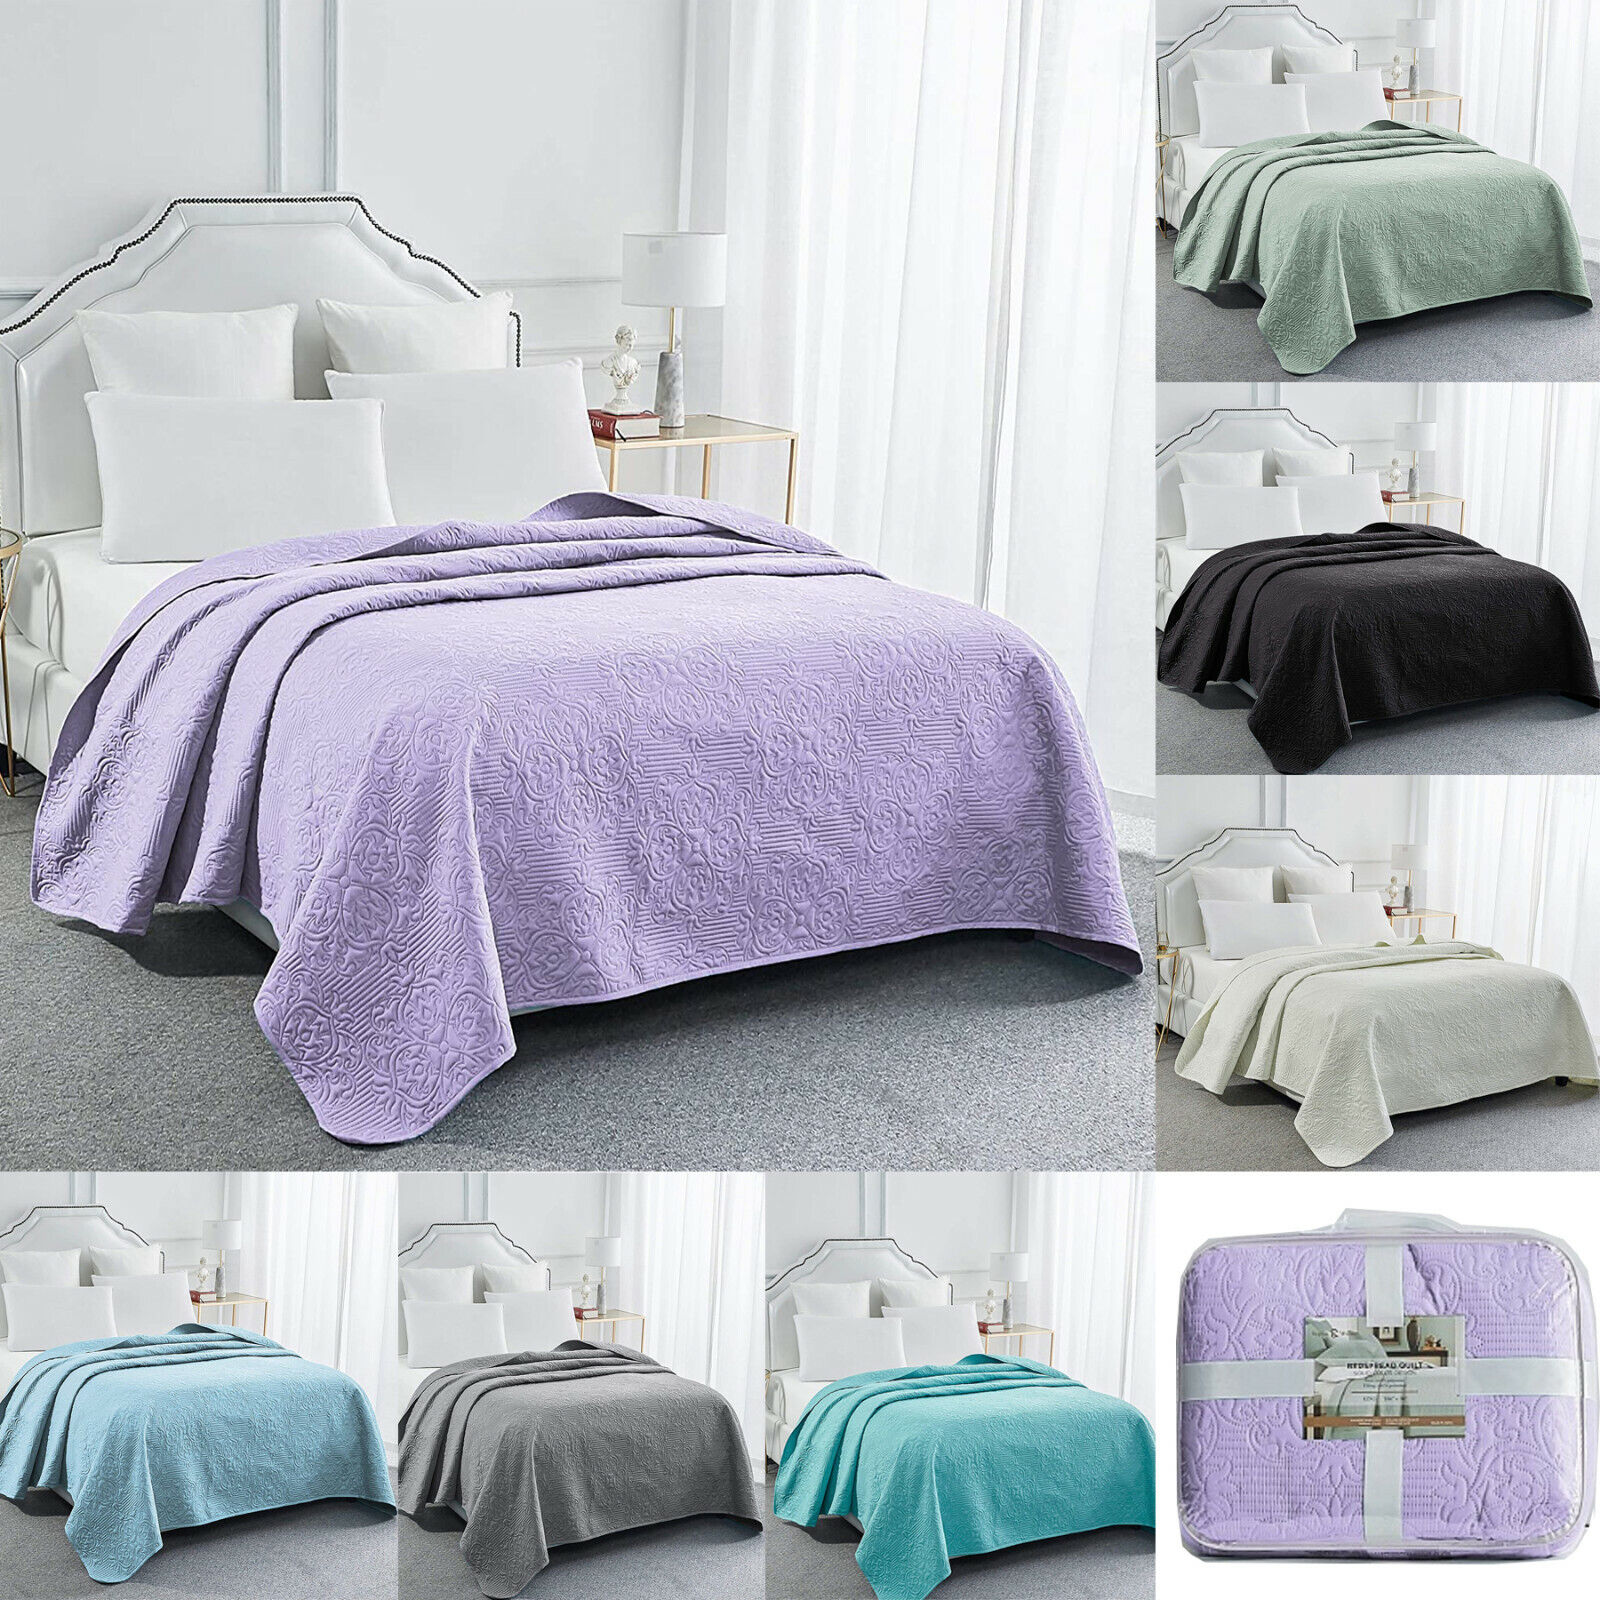 Embossed Bed Quilt Bedspread Soft Microfiber Bedding Coverle